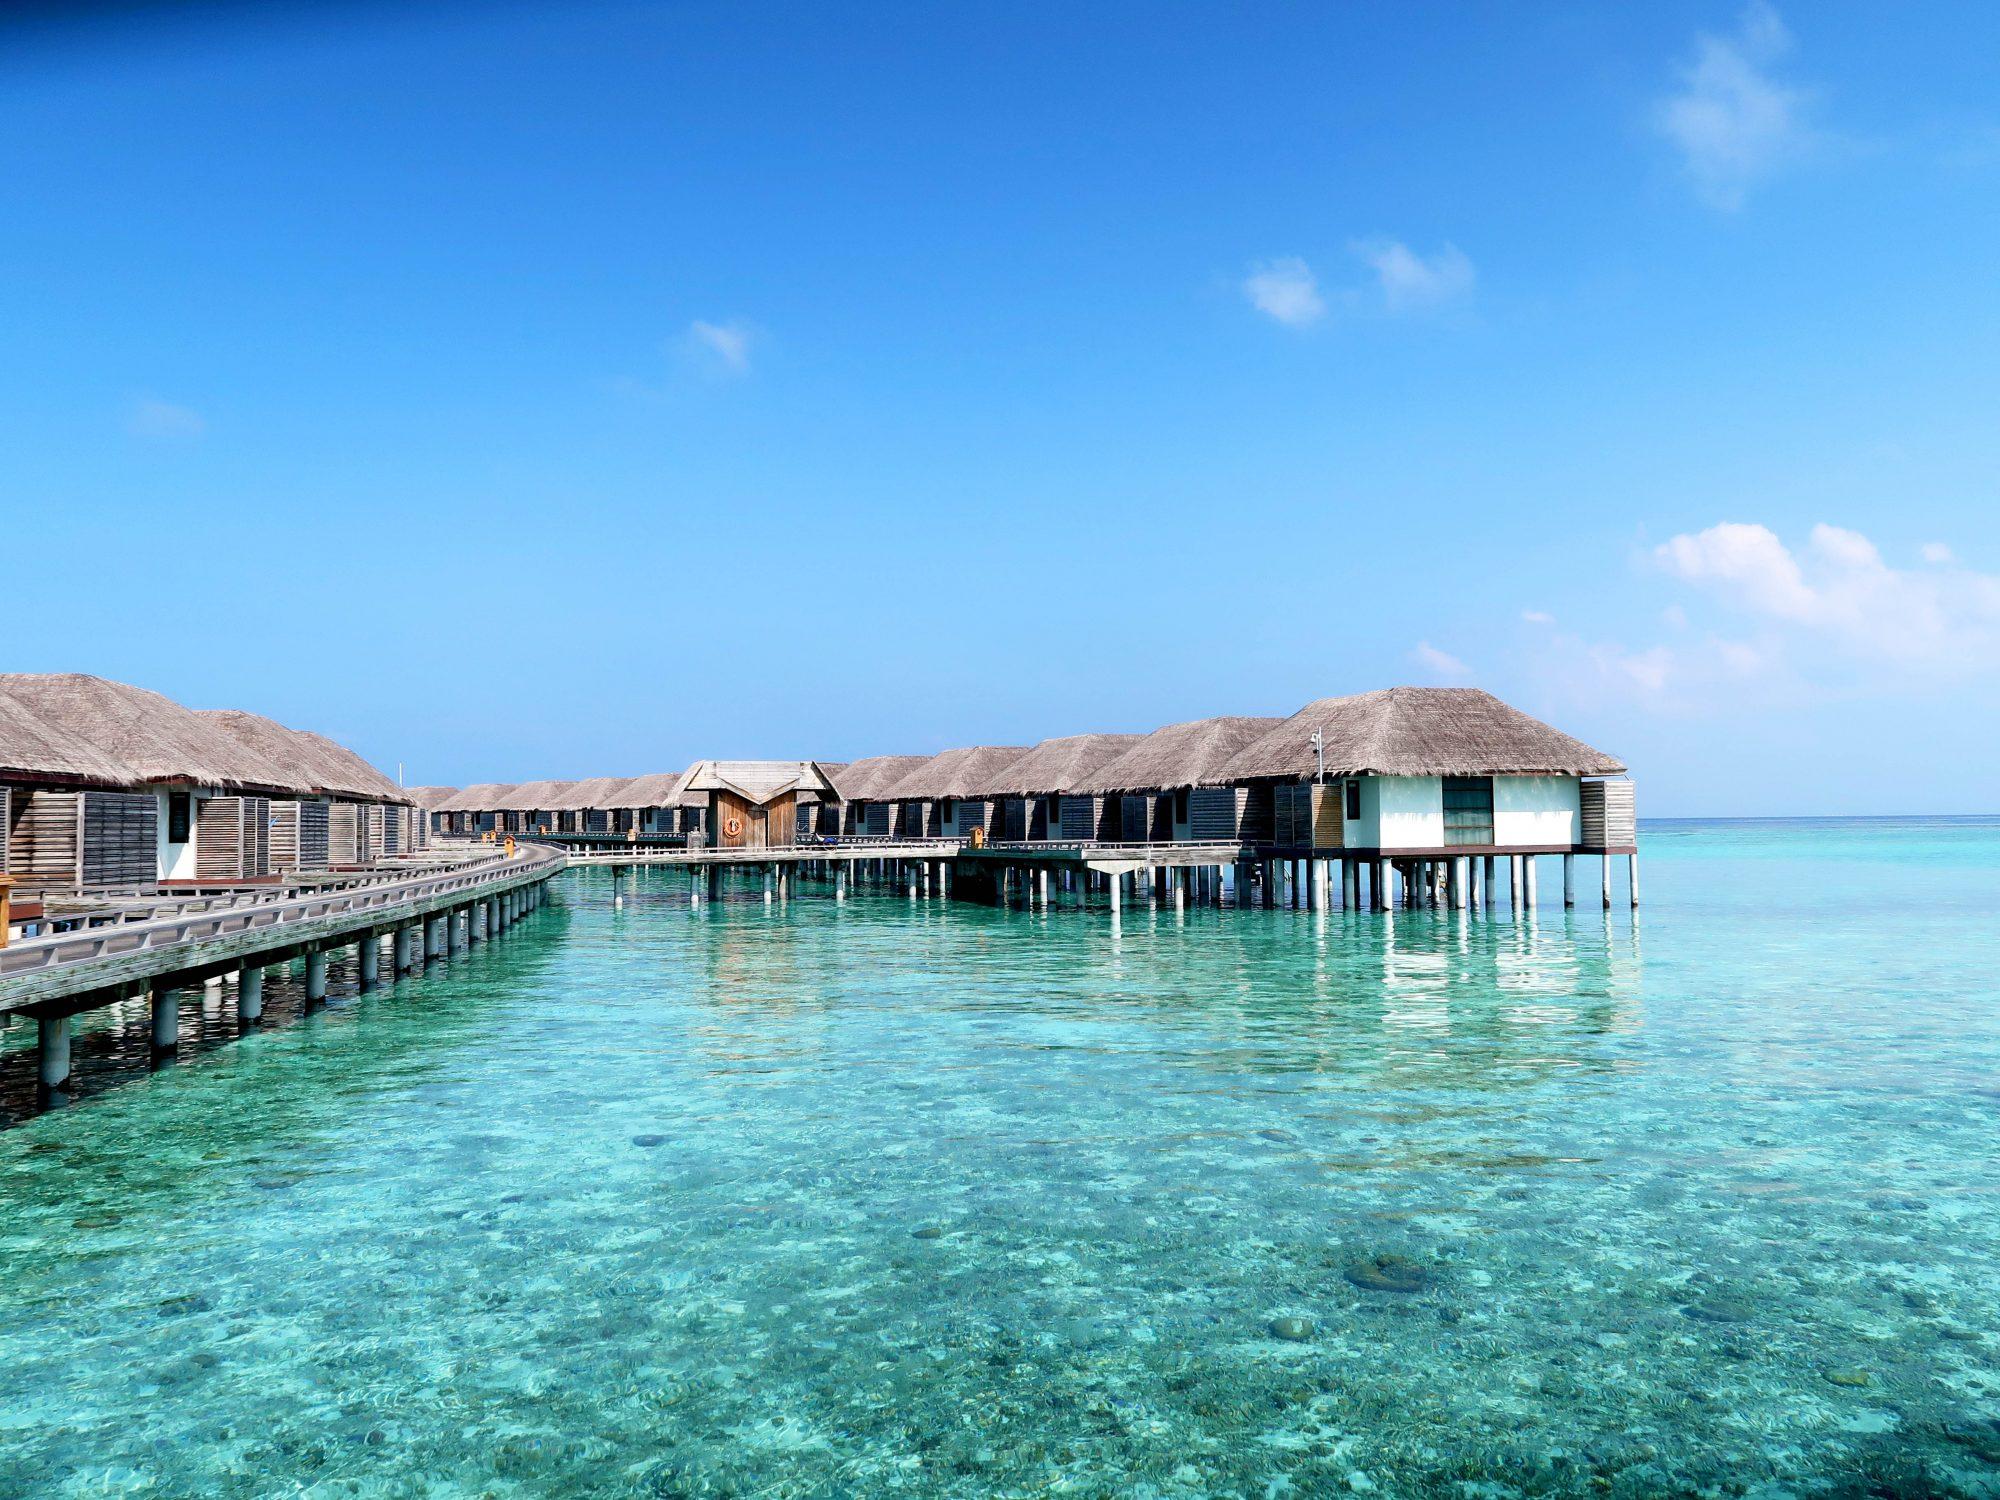 OUR MALDIVES ADVENTURE PART 3 | VELASSARU & WHAT I WORE